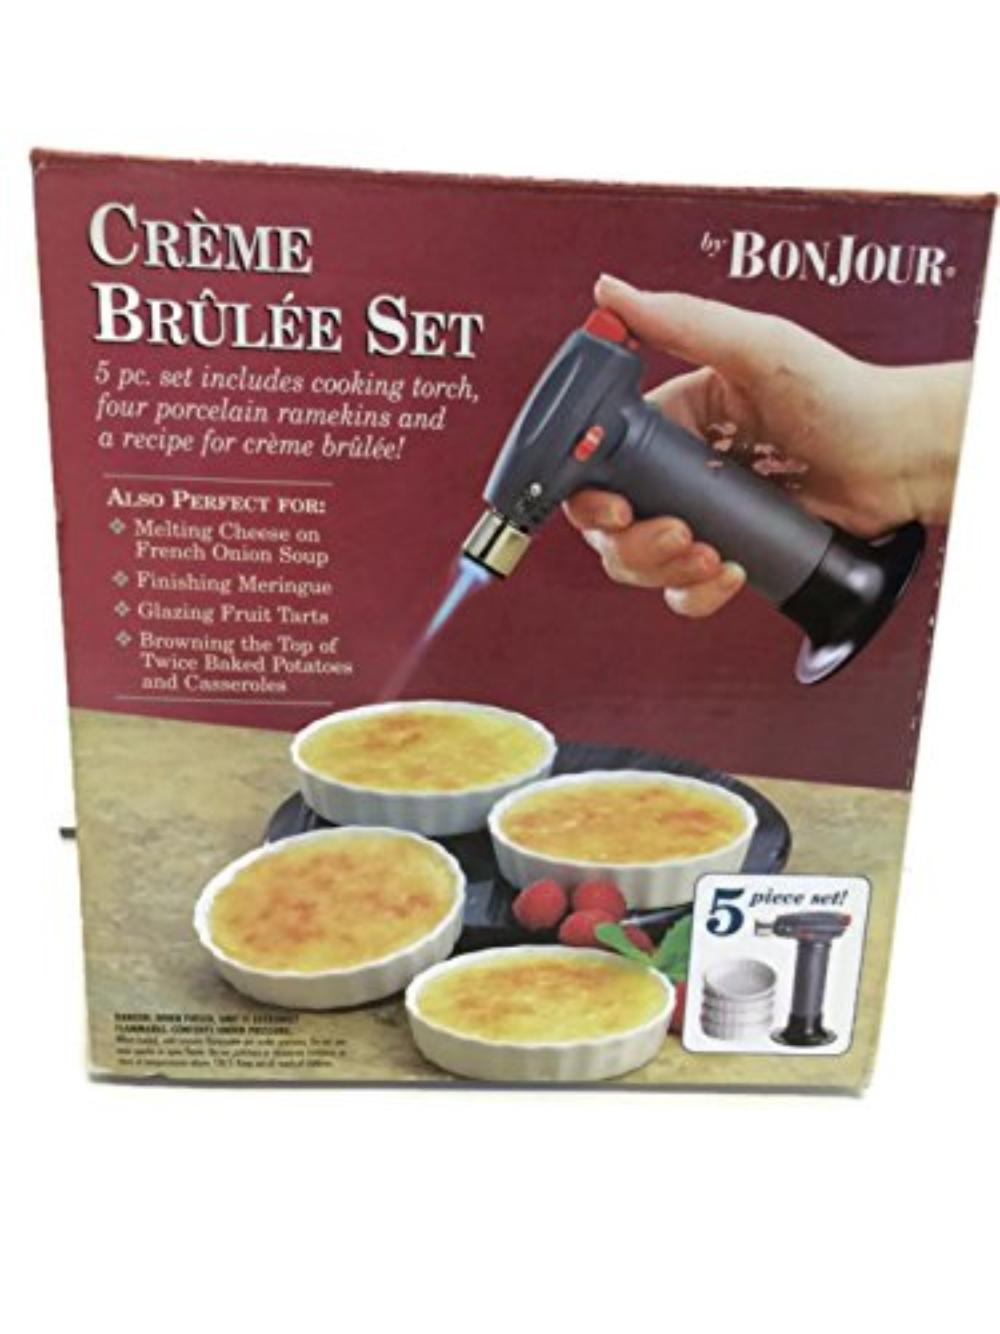 Bon Jour 5 Piece Creme Brulee Set Bed Bath And Beyond Includes Cooking Torch And 4 Ramekins By Bed Bath Beyond Walmart Com Walmart Com